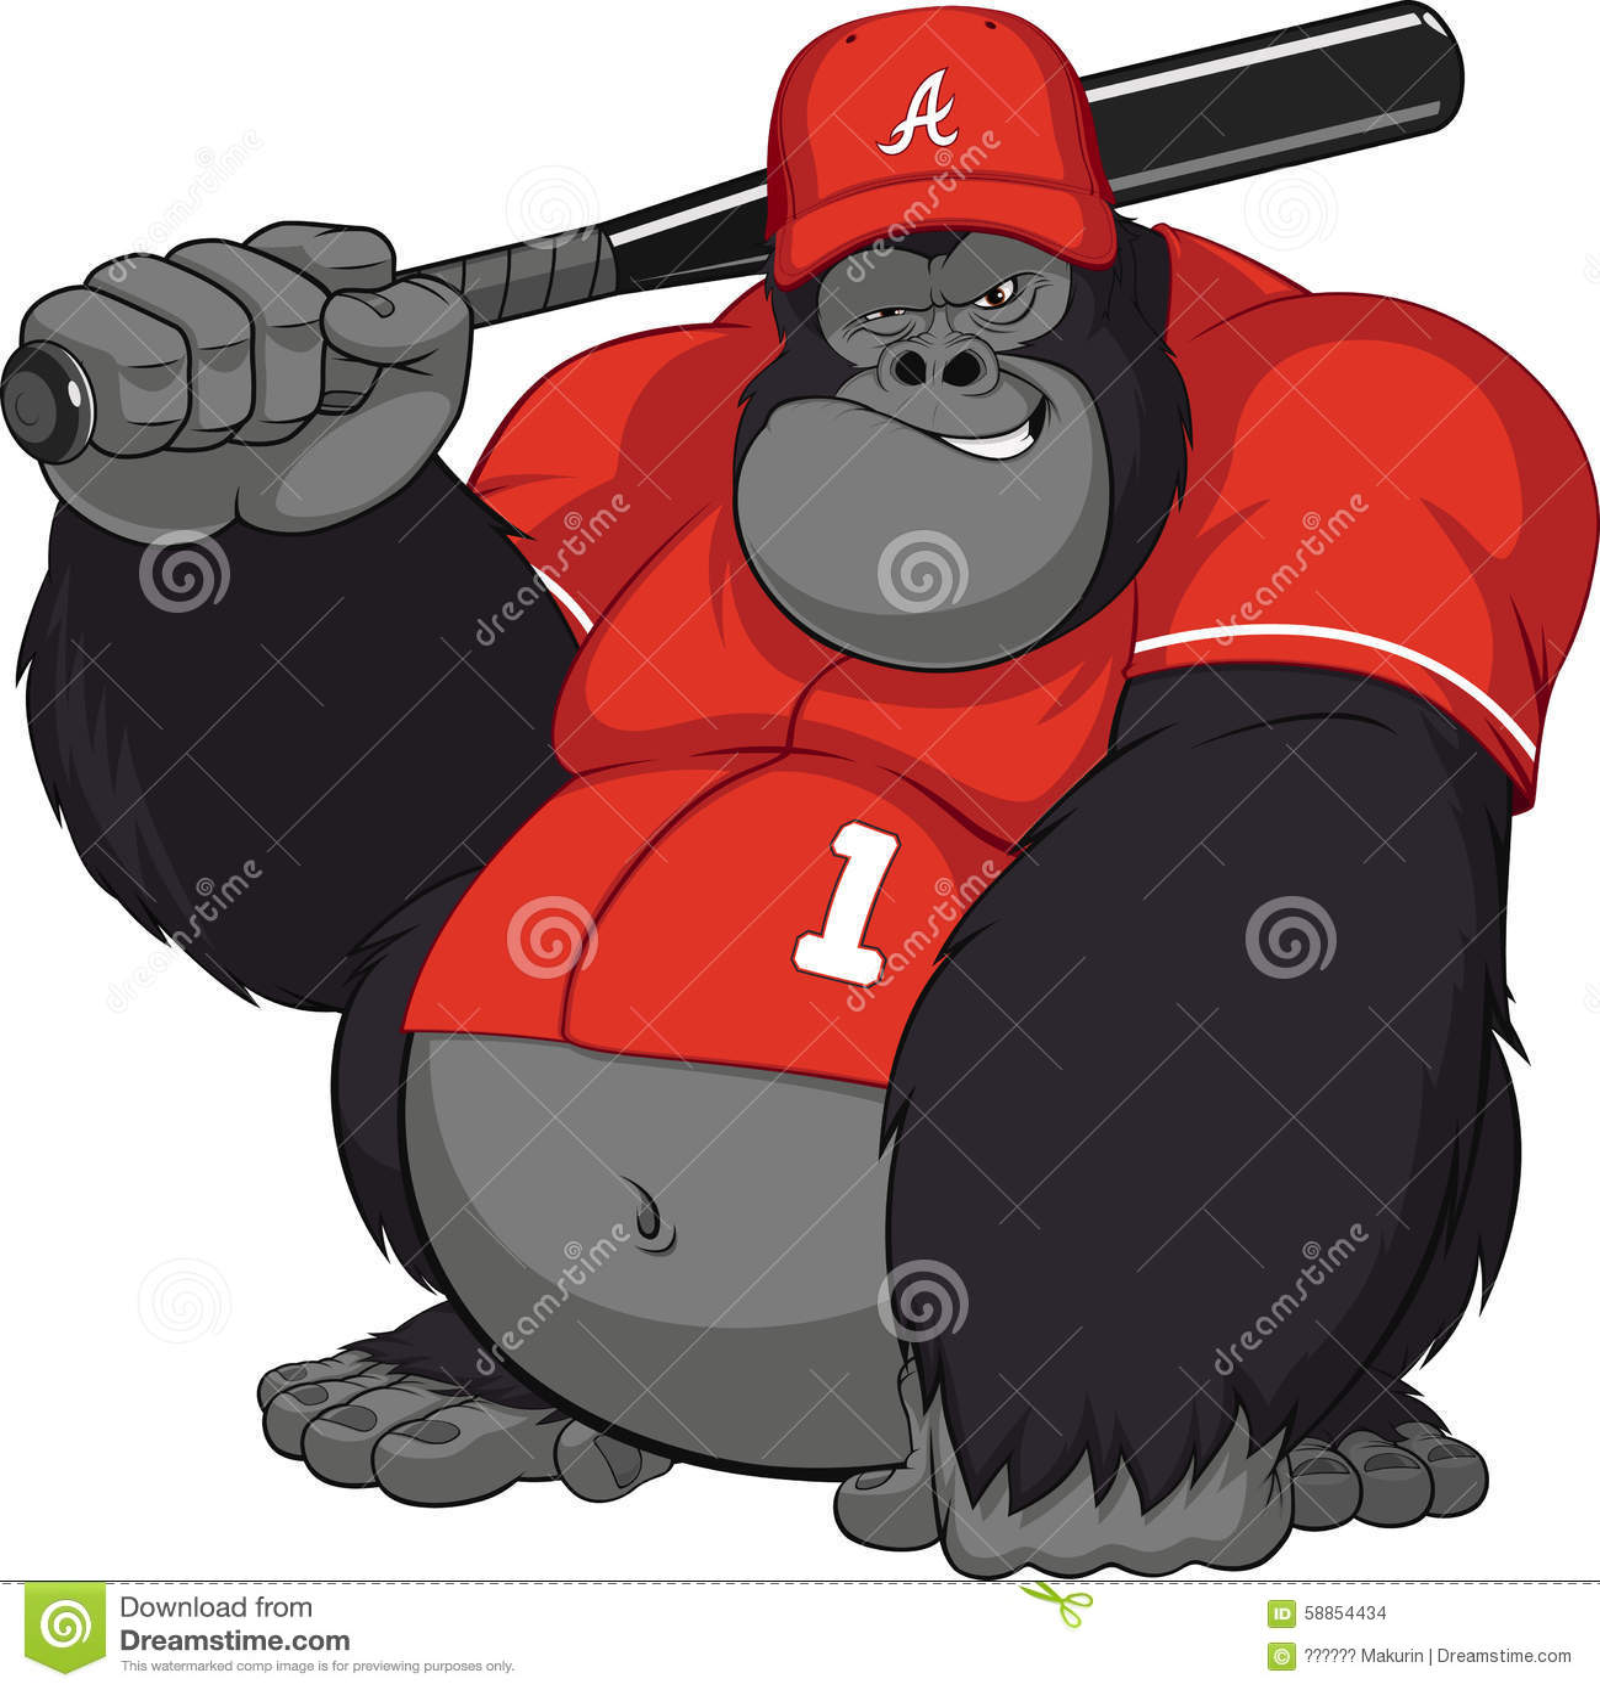 Funny monkey stock vector. Image of funny, baseballbat ...